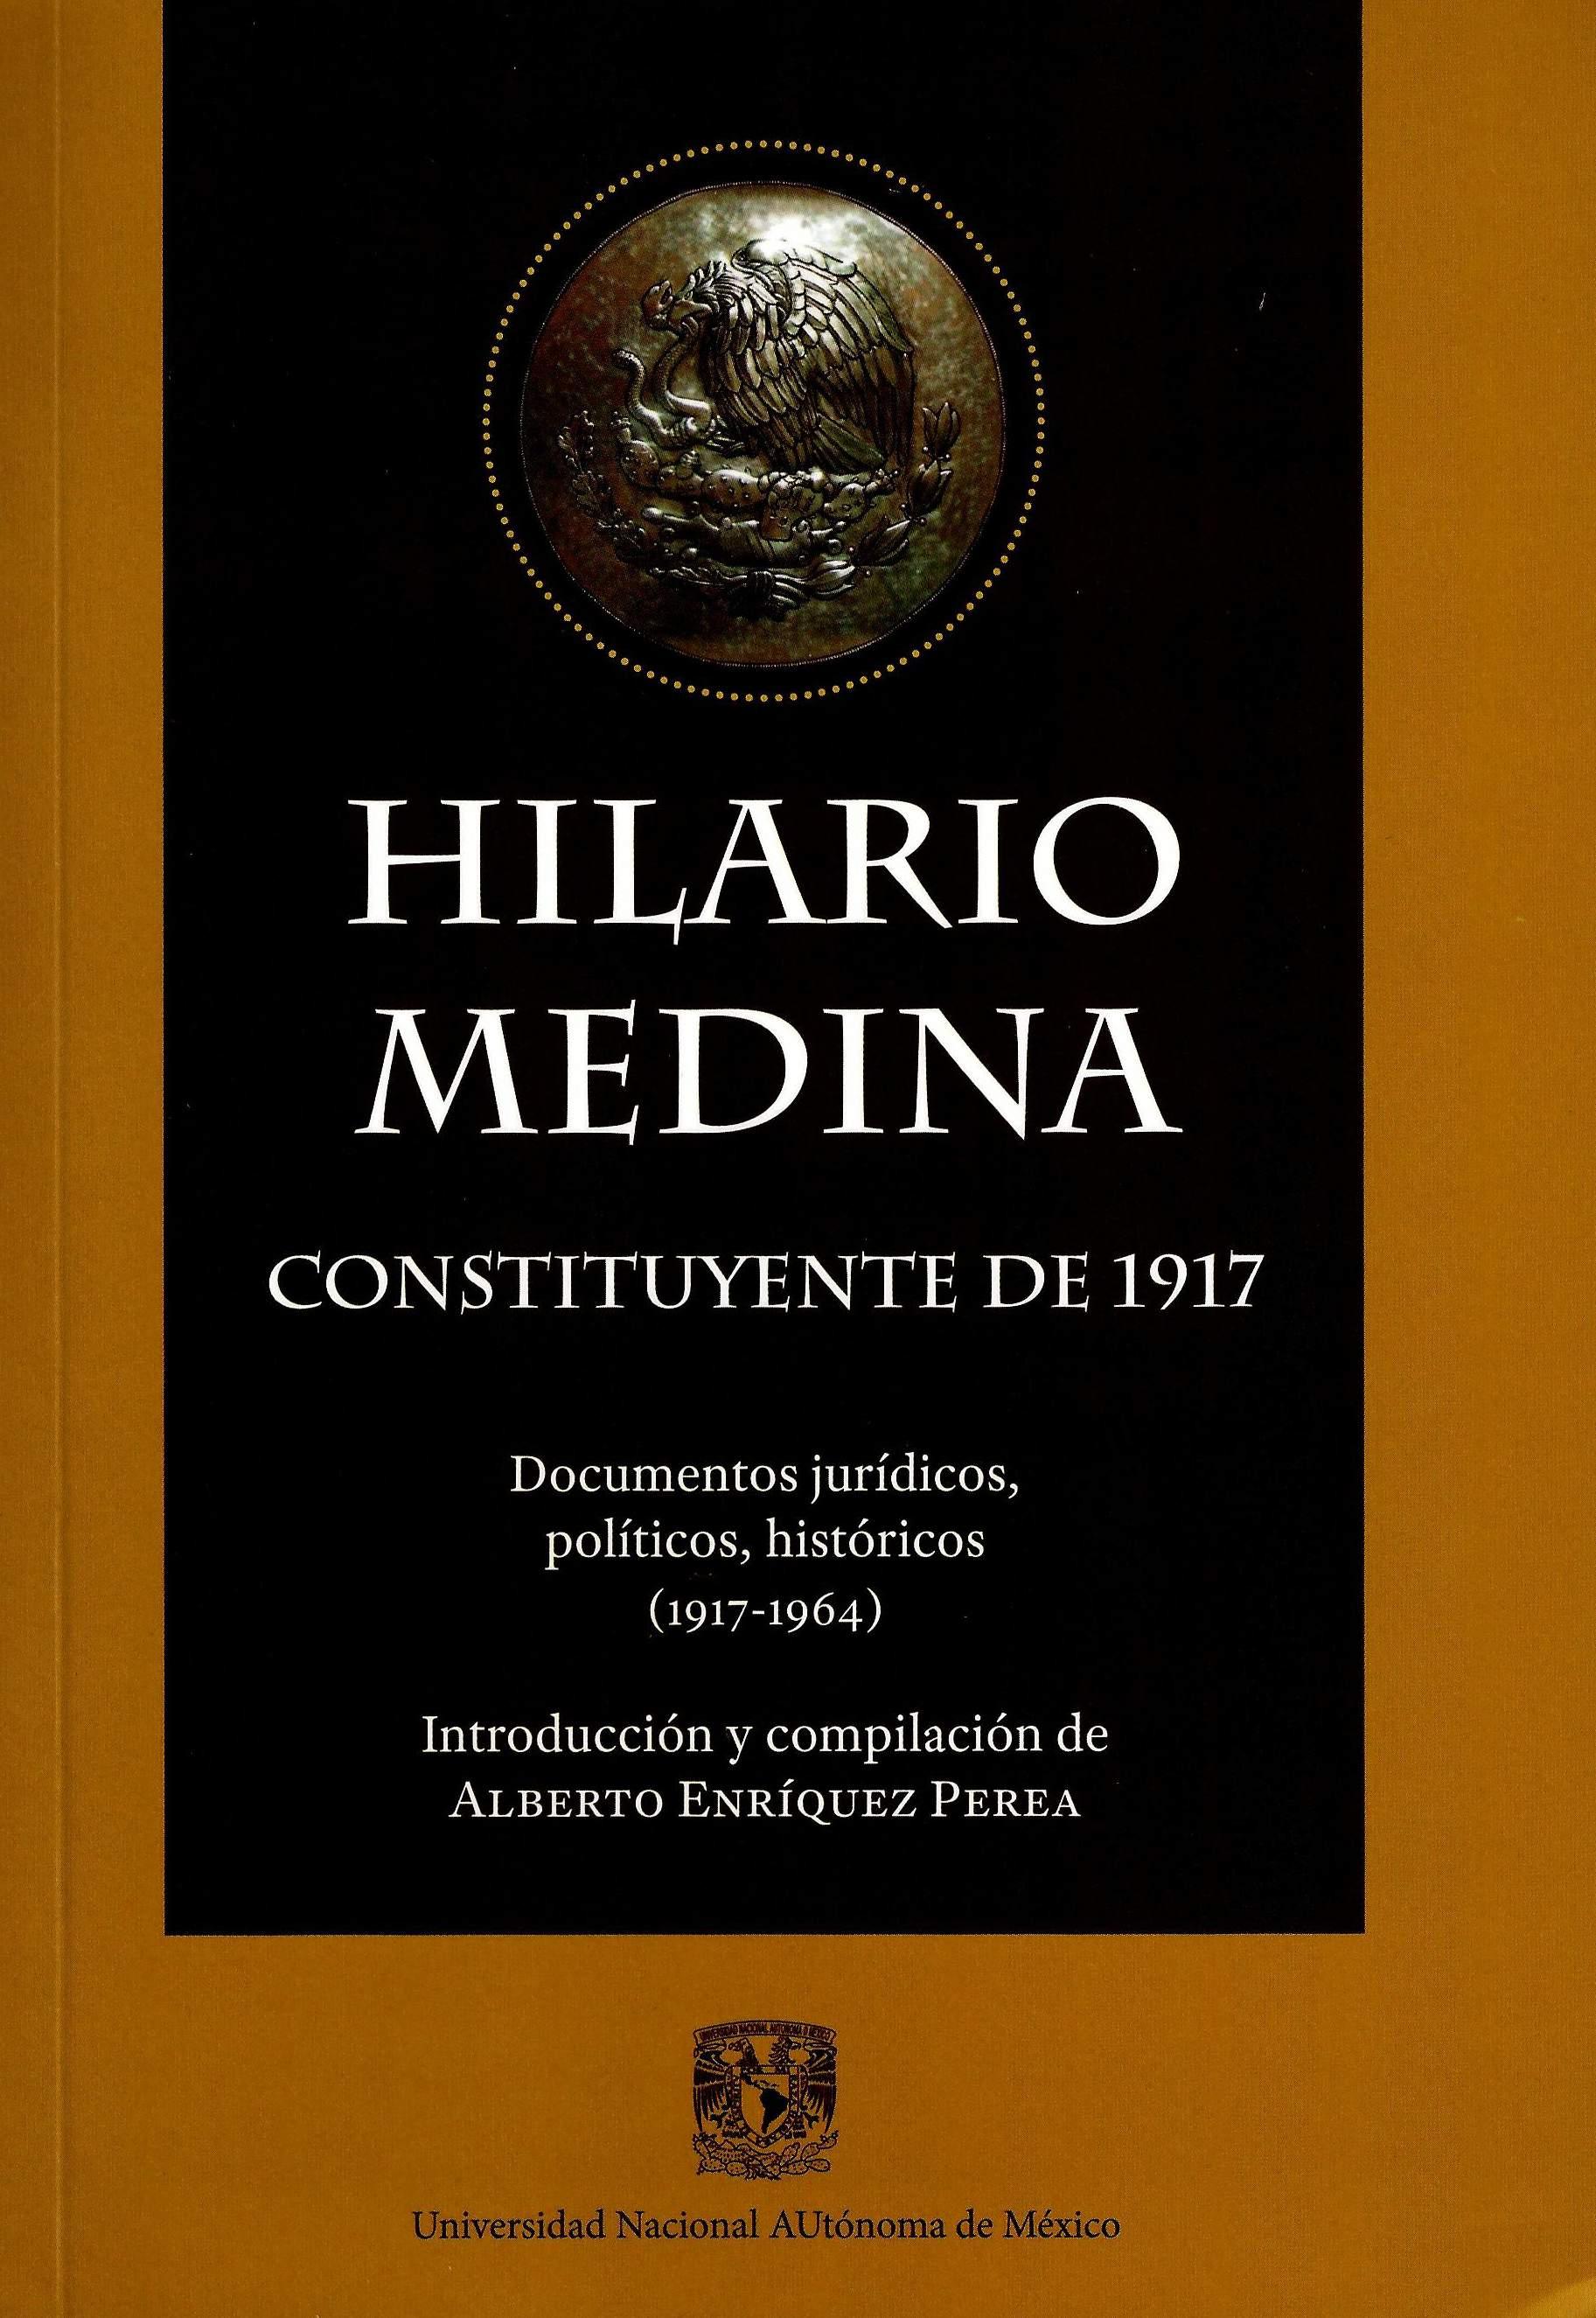 Hilario Medina, constituyente de 1917. Documentos jurídicos, políticos, históricos (1917-1964)